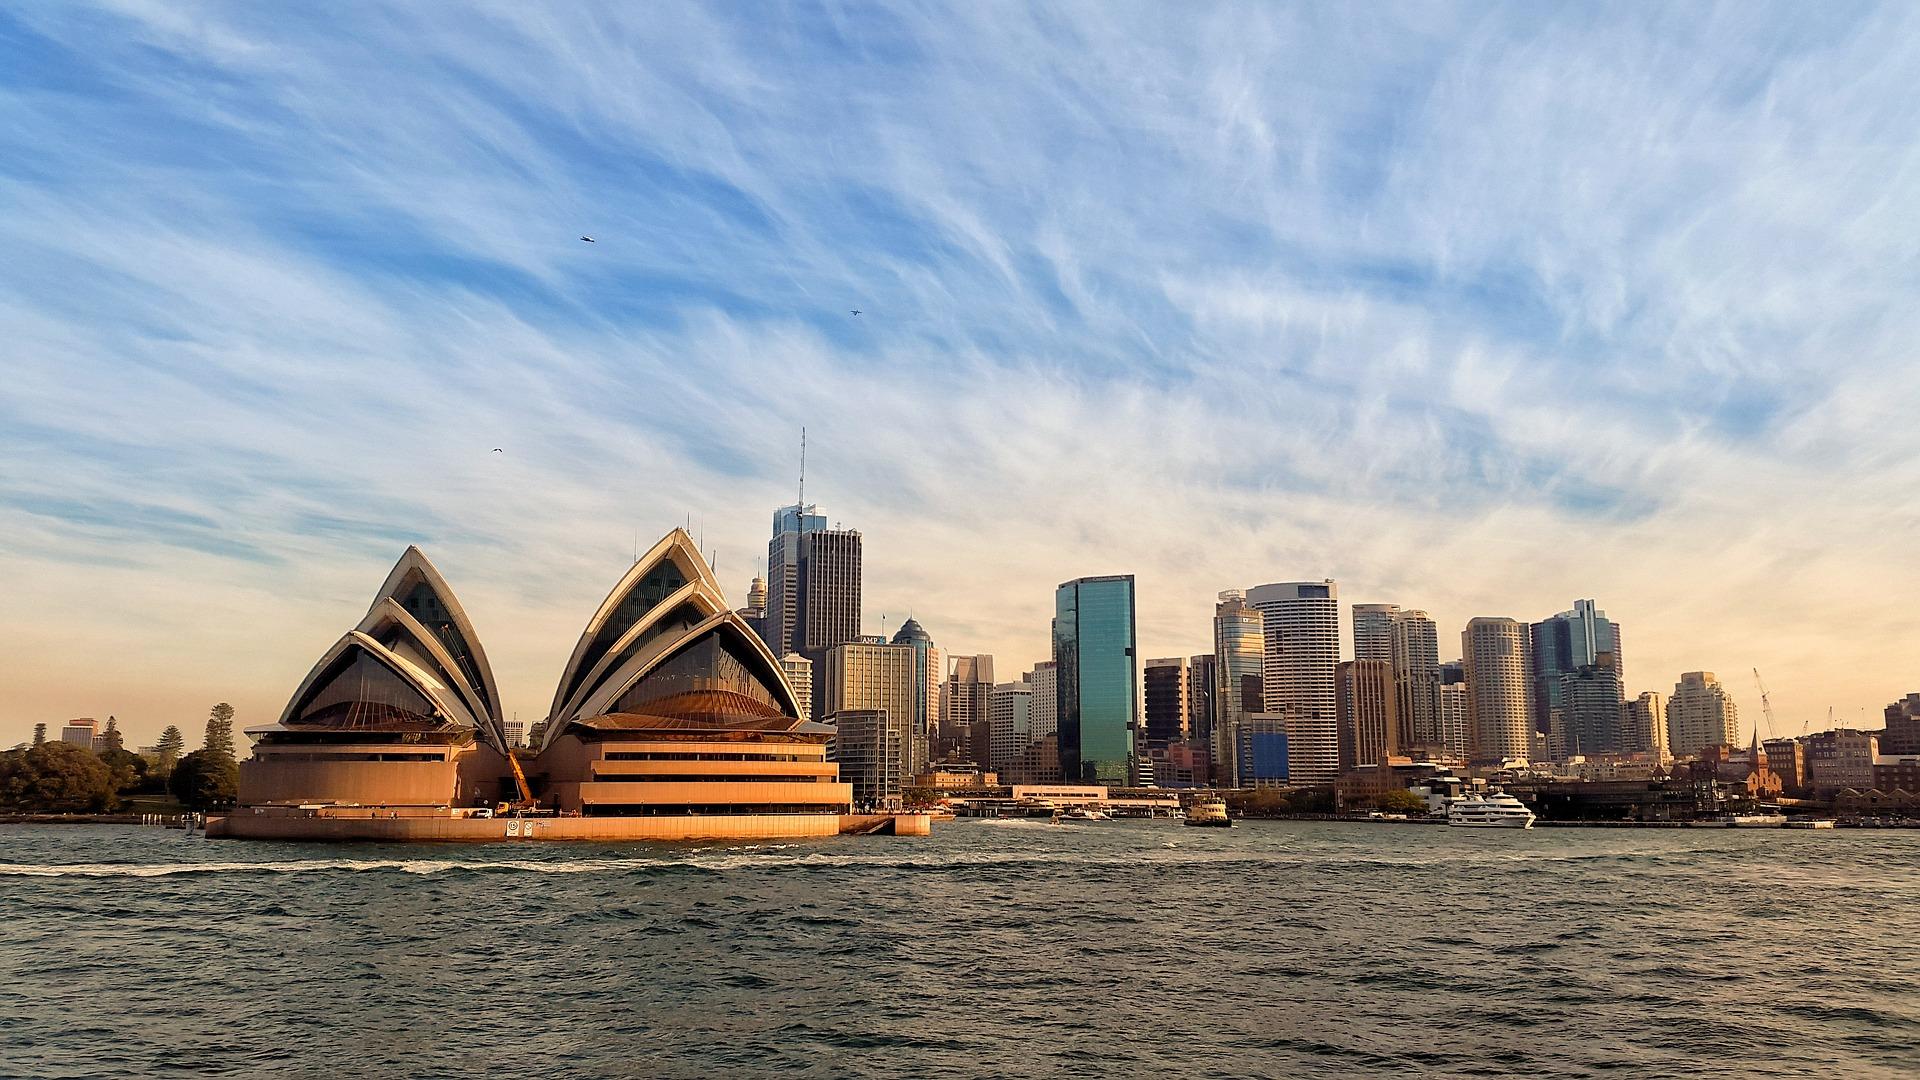 AUSTRALIA ERGONOMICS & ENVIRONMENTAL HEALTH AND SAFETY REQUIREMENTS